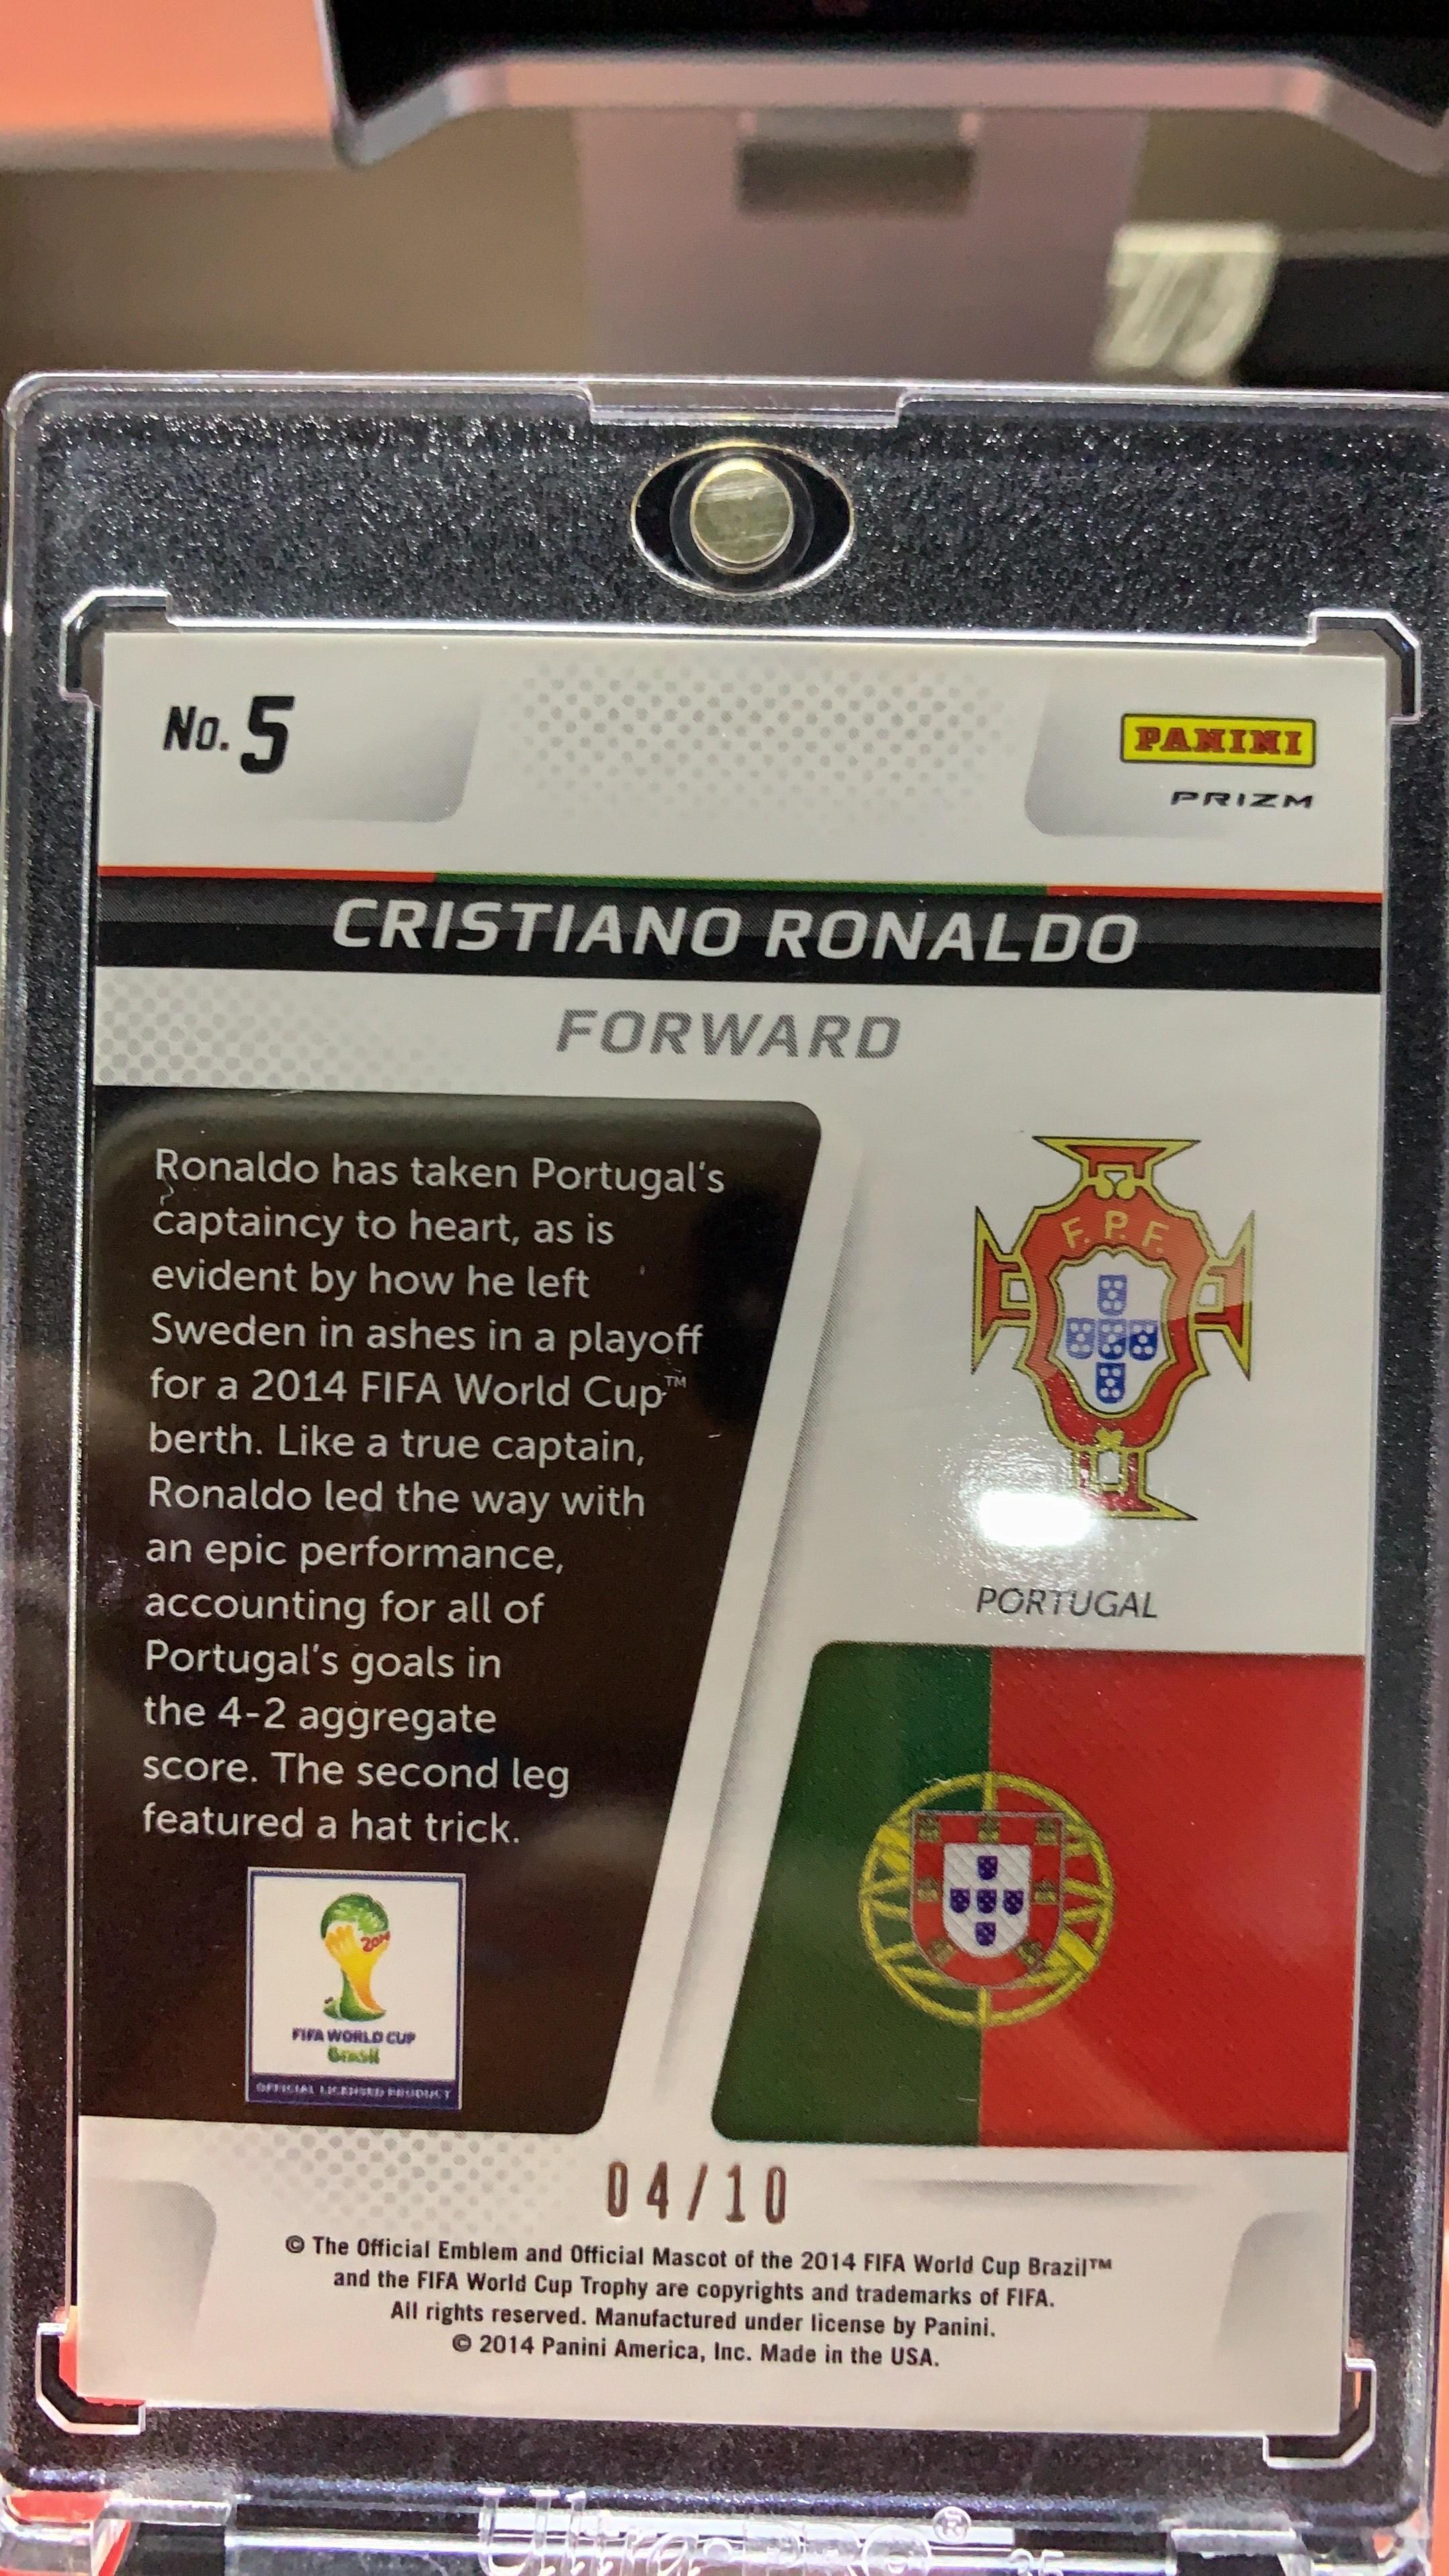 2014 prizm 世界杯 对长特卡 葡萄牙 C罗 罗纳尔多 金折4/10 实卡美如画 不要错过 不要等起飞再抢